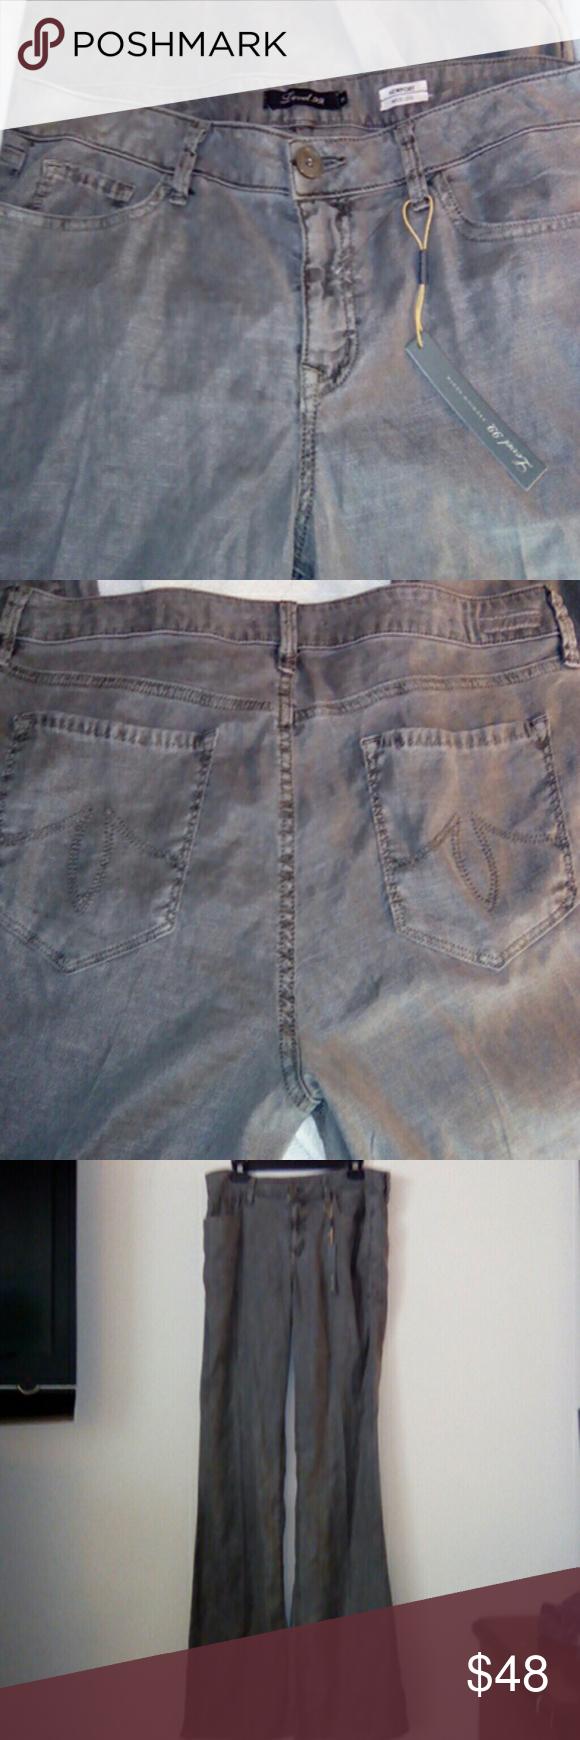 NWT Level 99 Pants Sz 31 Gray. 35 inch inseam. 51% linen, 46% tencel, 3% spandex. Newport Wide Leg. Level 99 Pants